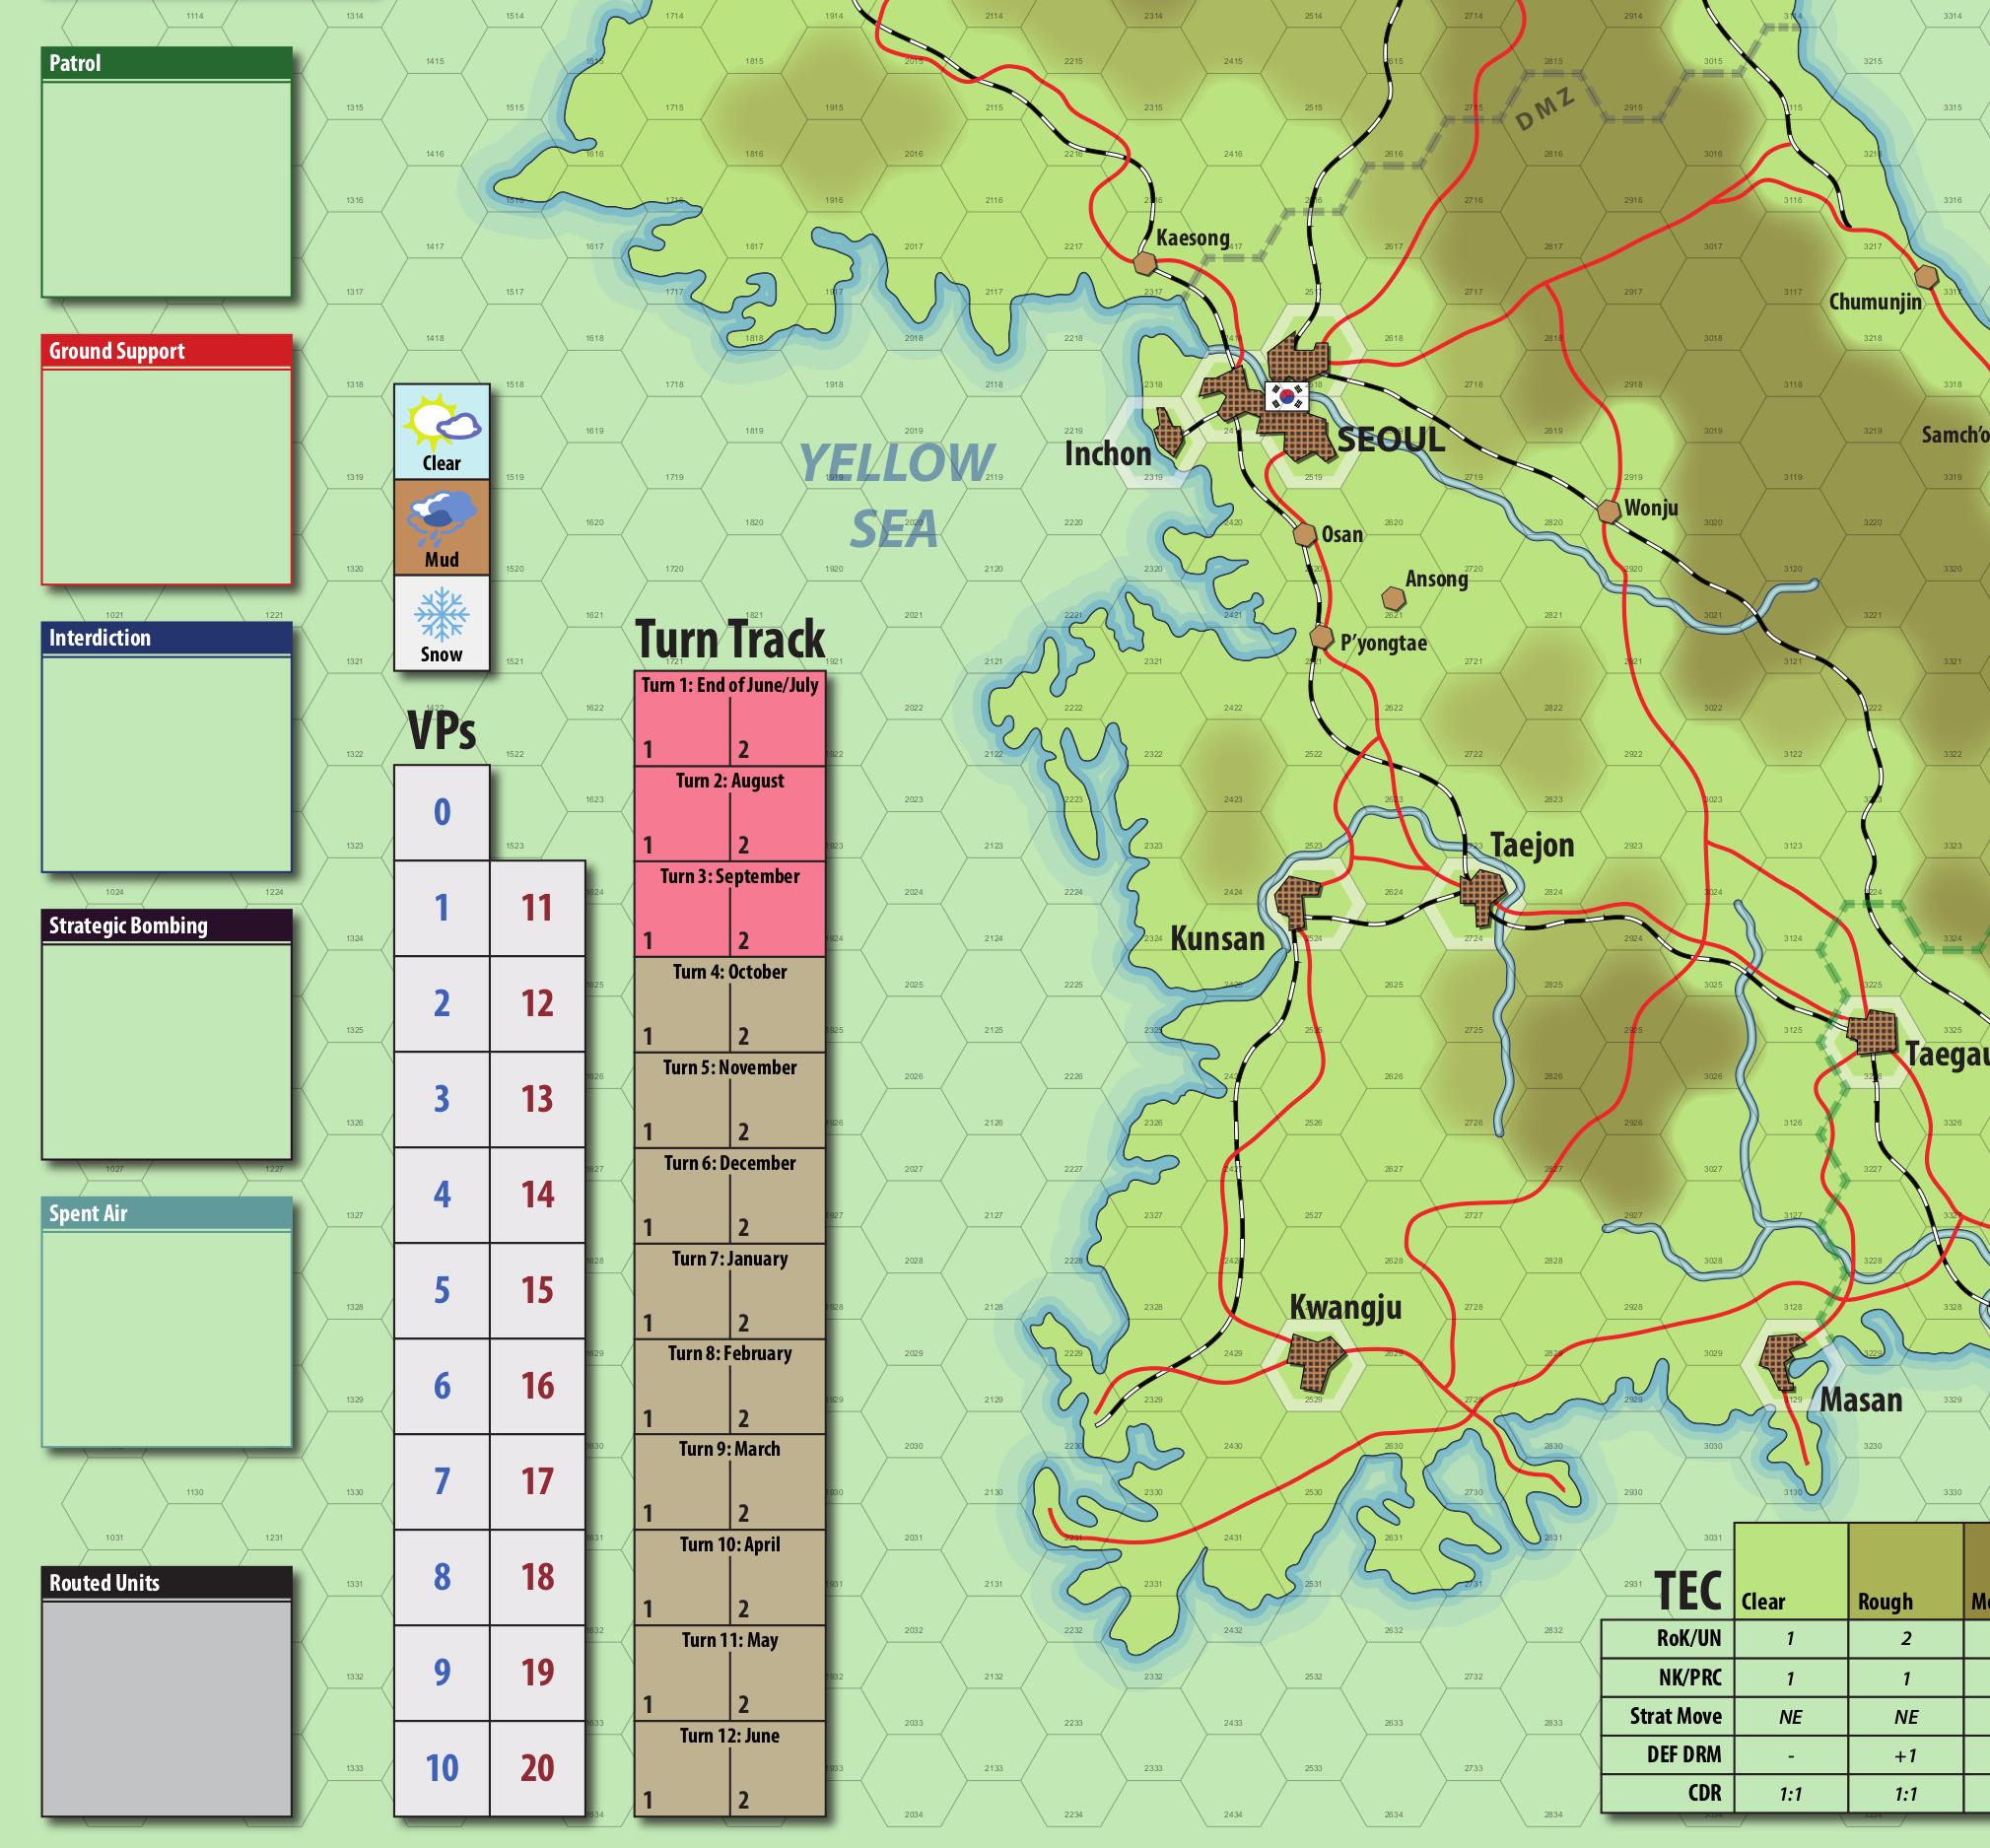 Map Sample by Ilya Kudriashov